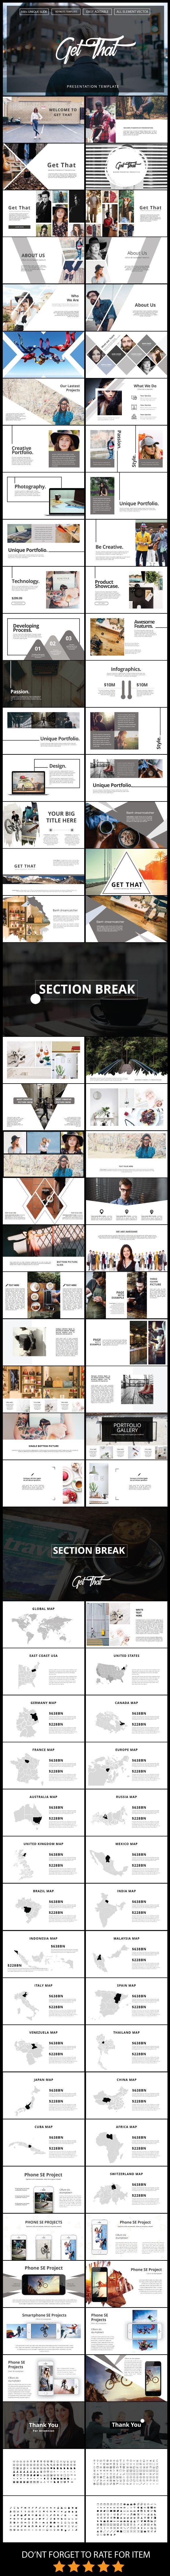 Pin de 柳多多 en Creative | Pinterest | Portafolio, Diseños de ...